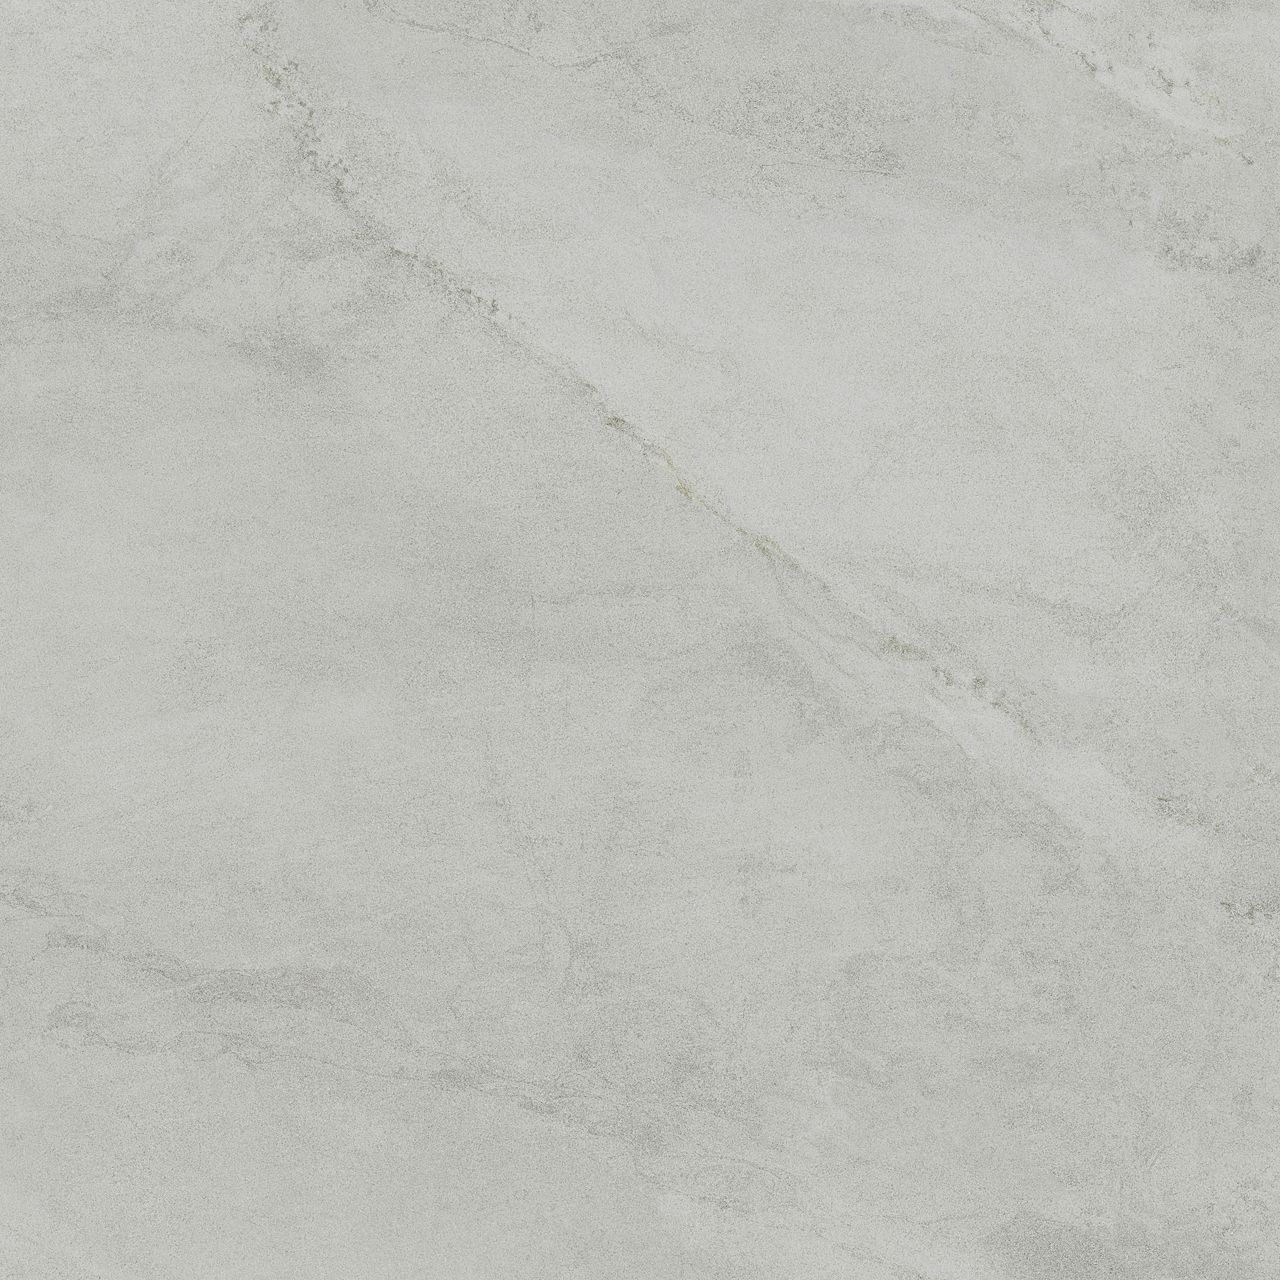 Blanc Concrete - Group 1/2